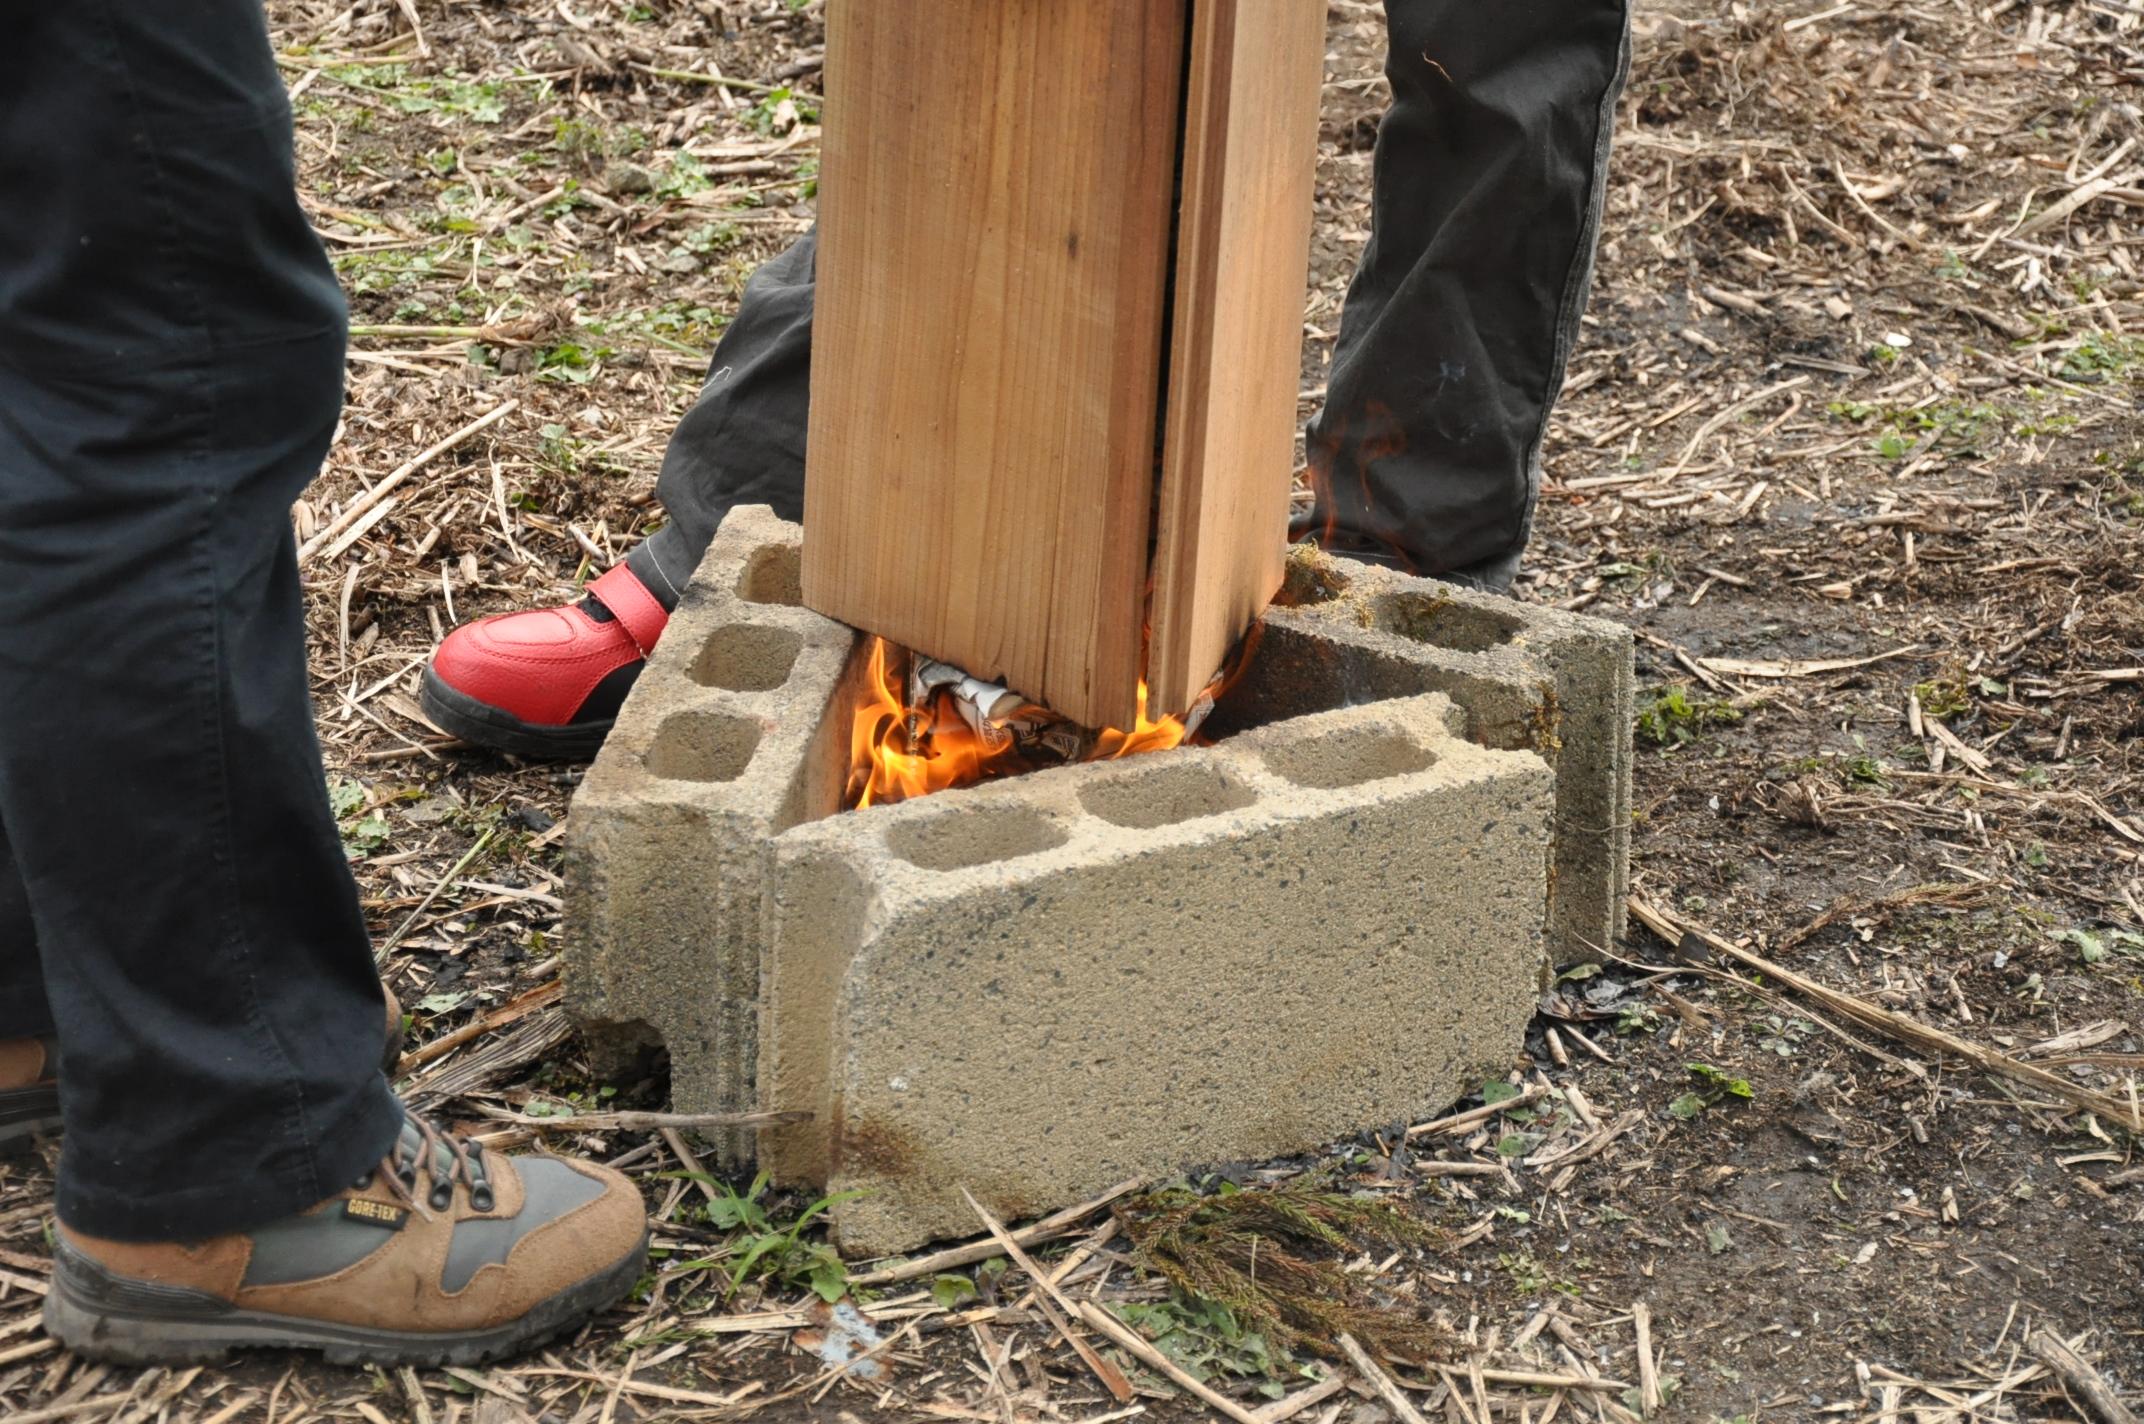 築200年の古民家、焼杉板を焼く!!|古民家再生DIY|火種2